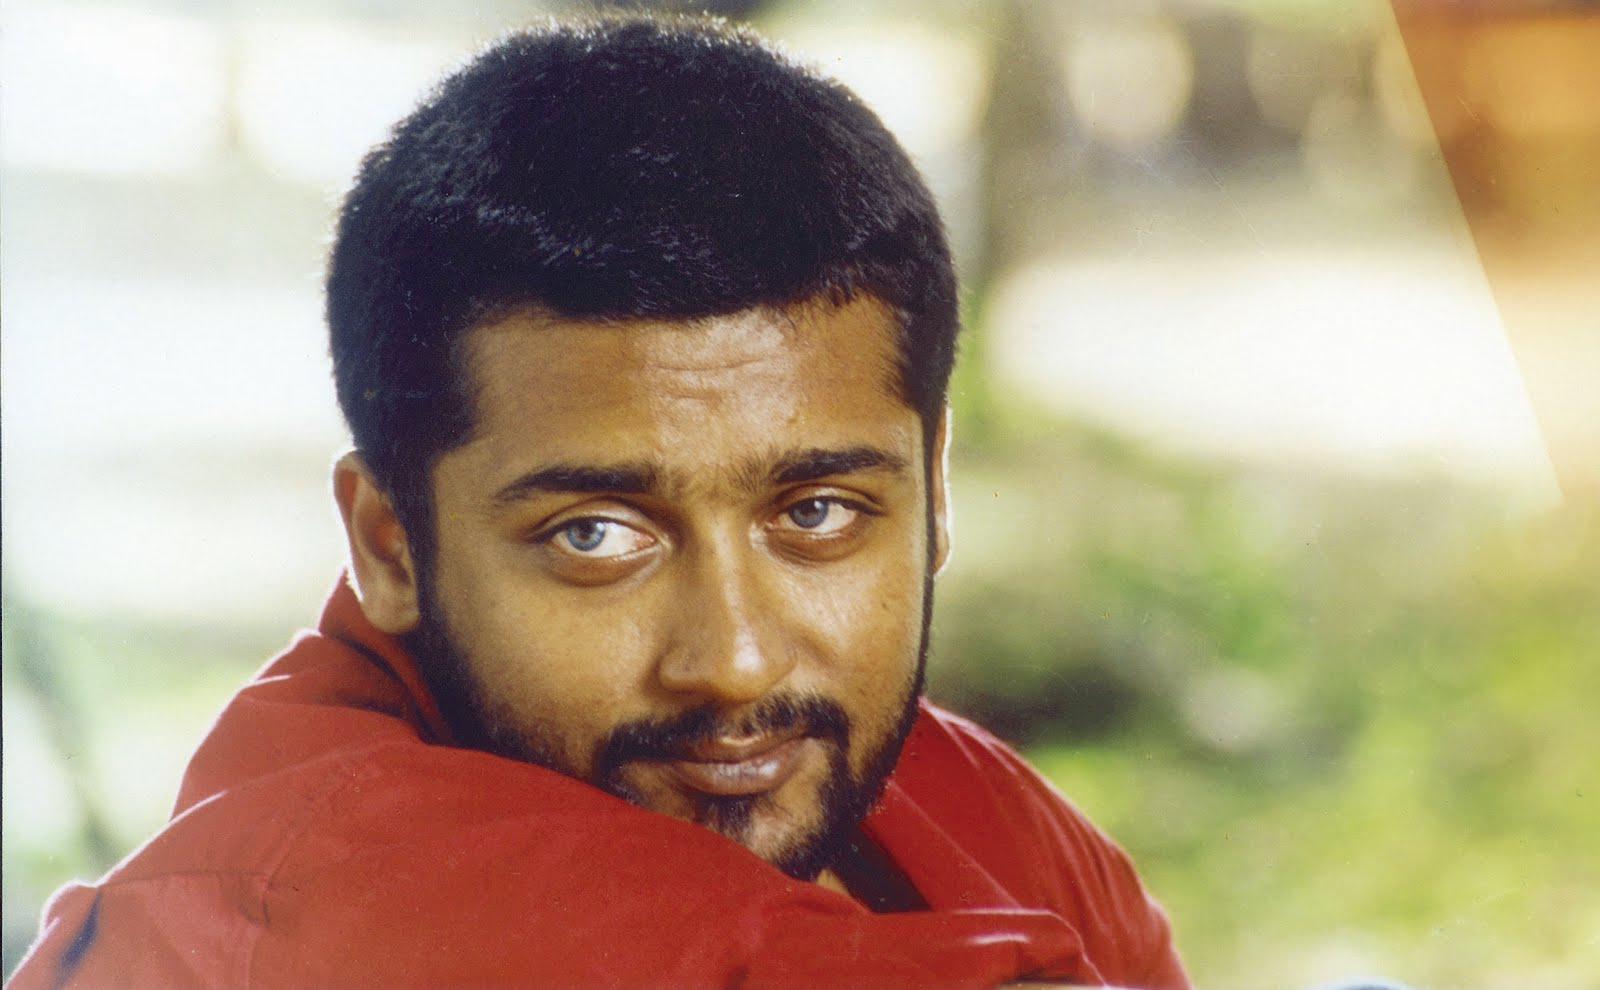 All About Surya Only About Surya 24 The Movie: 'Surya-Bala' Telugu Movie HQ Pics.